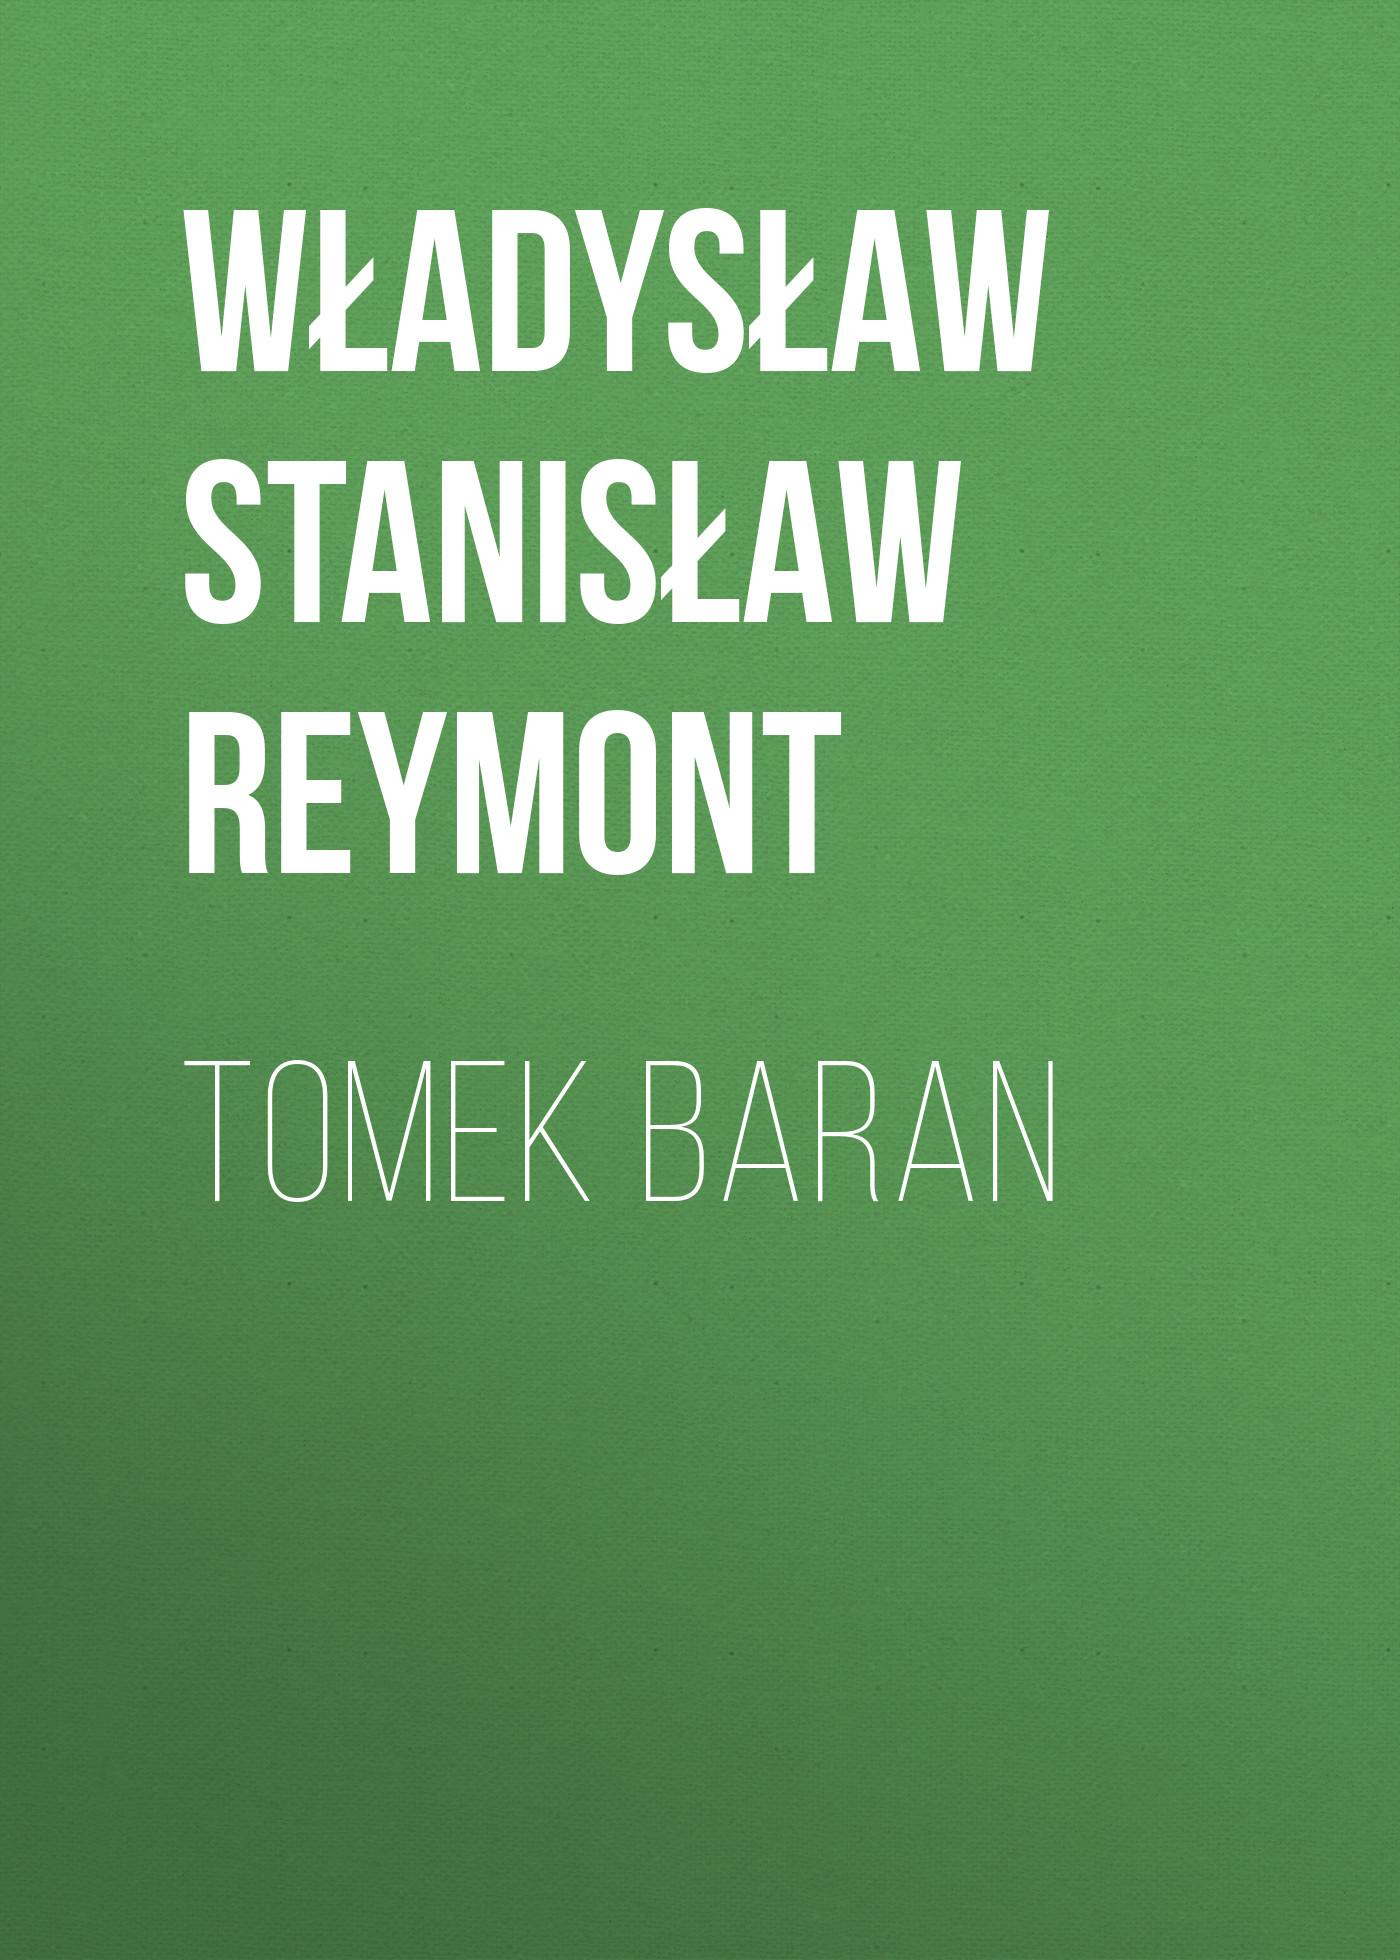 Tomek Baran